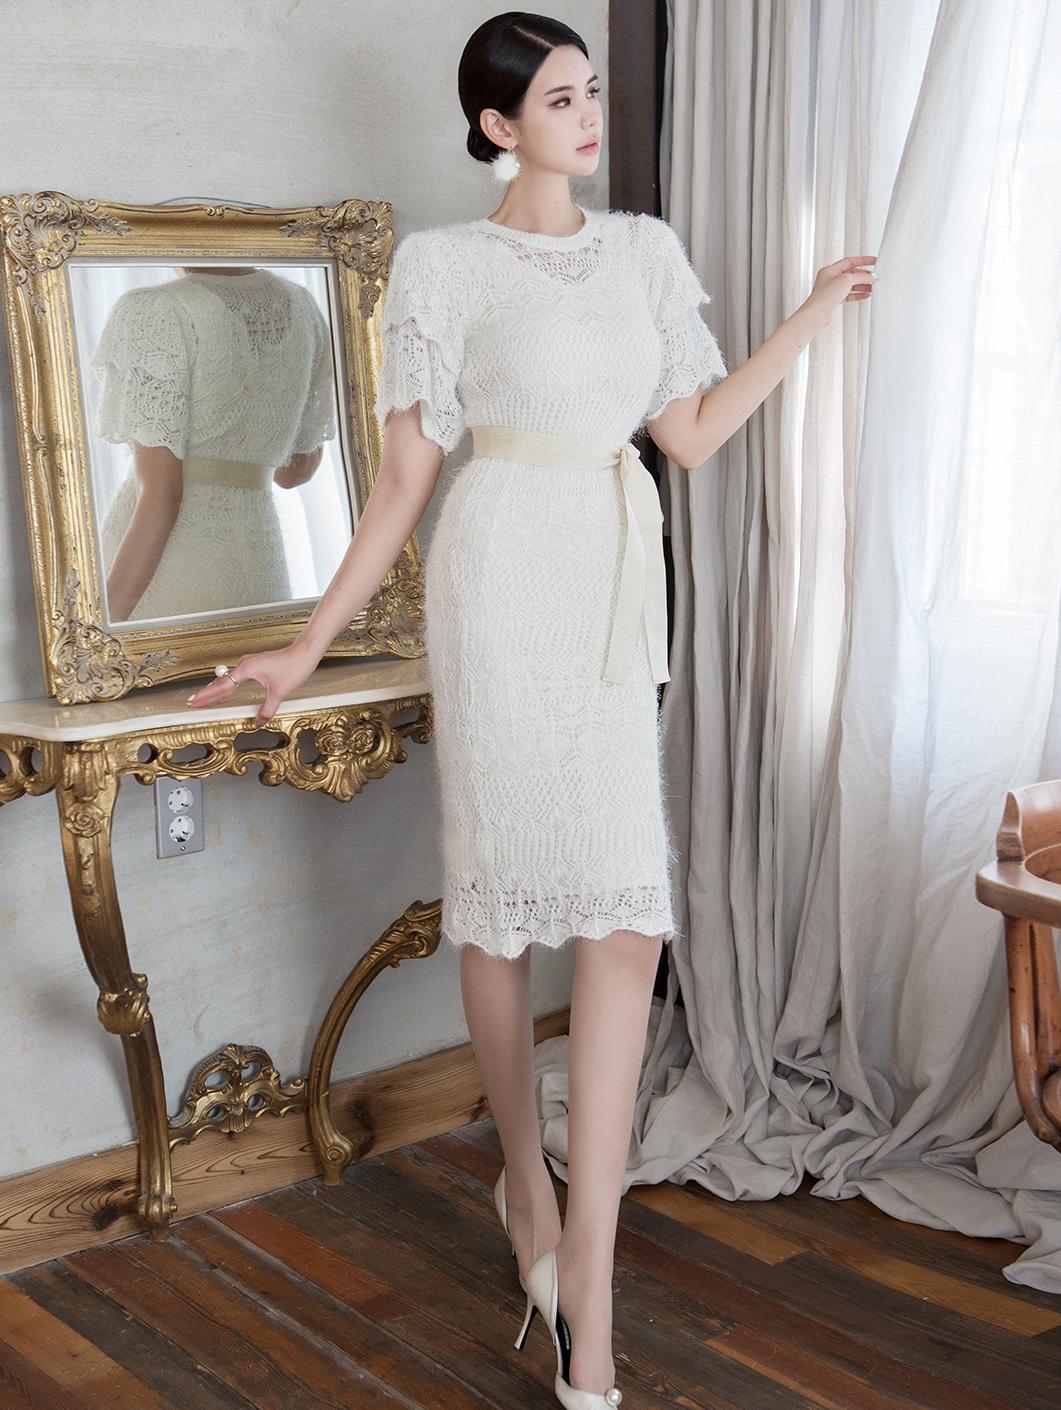 D3945 双层荷叶边针织连身裙 (内里丶腰带组合)